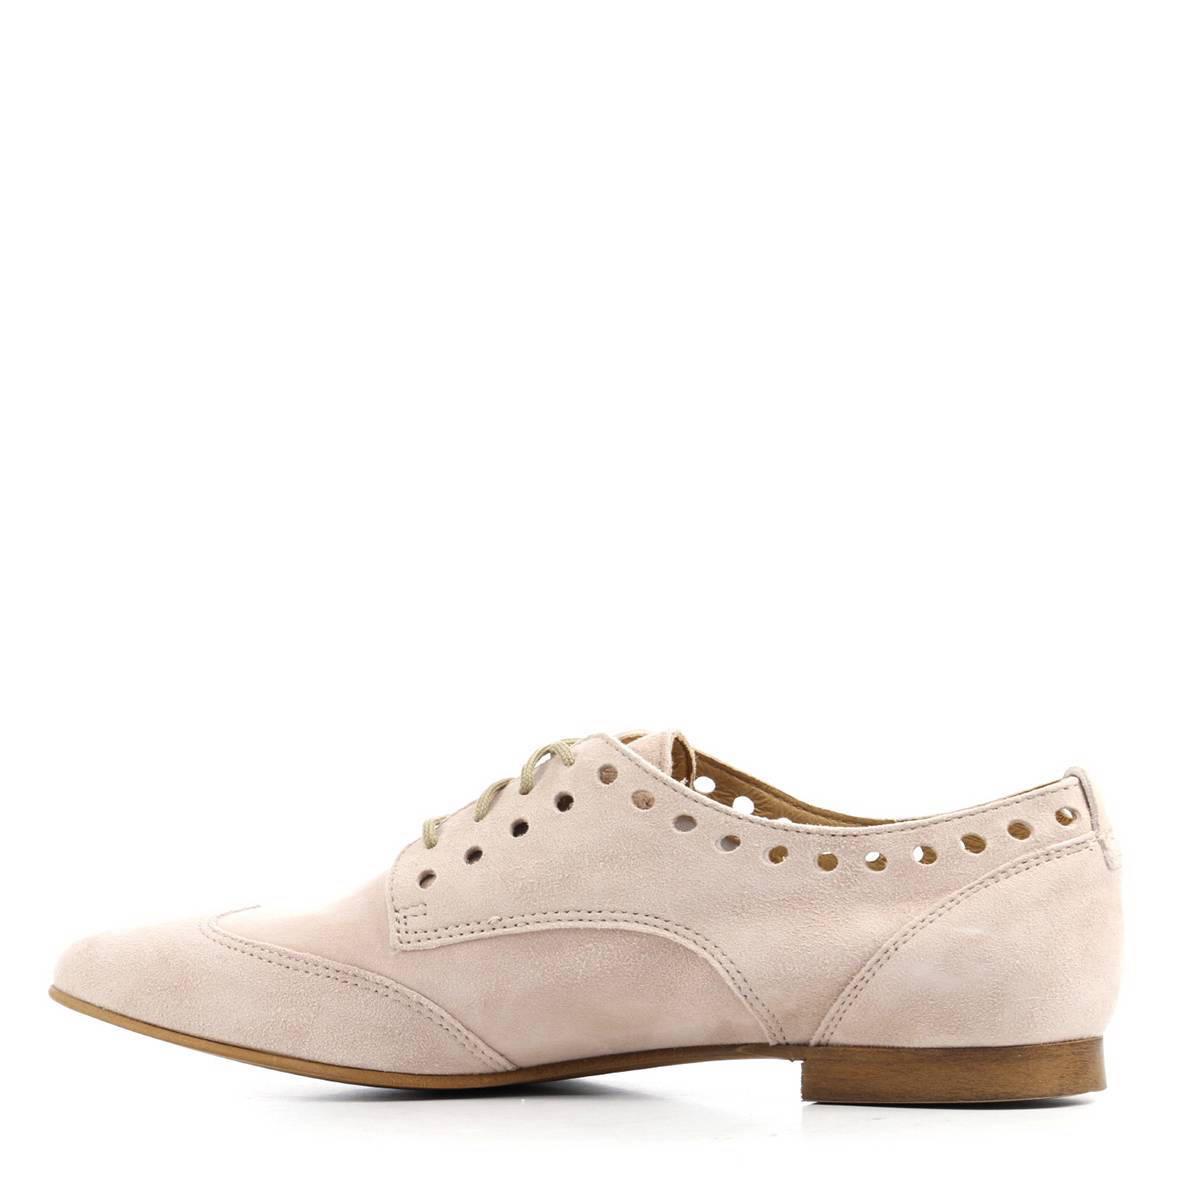 Chaussures Roses Lamica Avec Dames Lacer ZO3C2pHIq